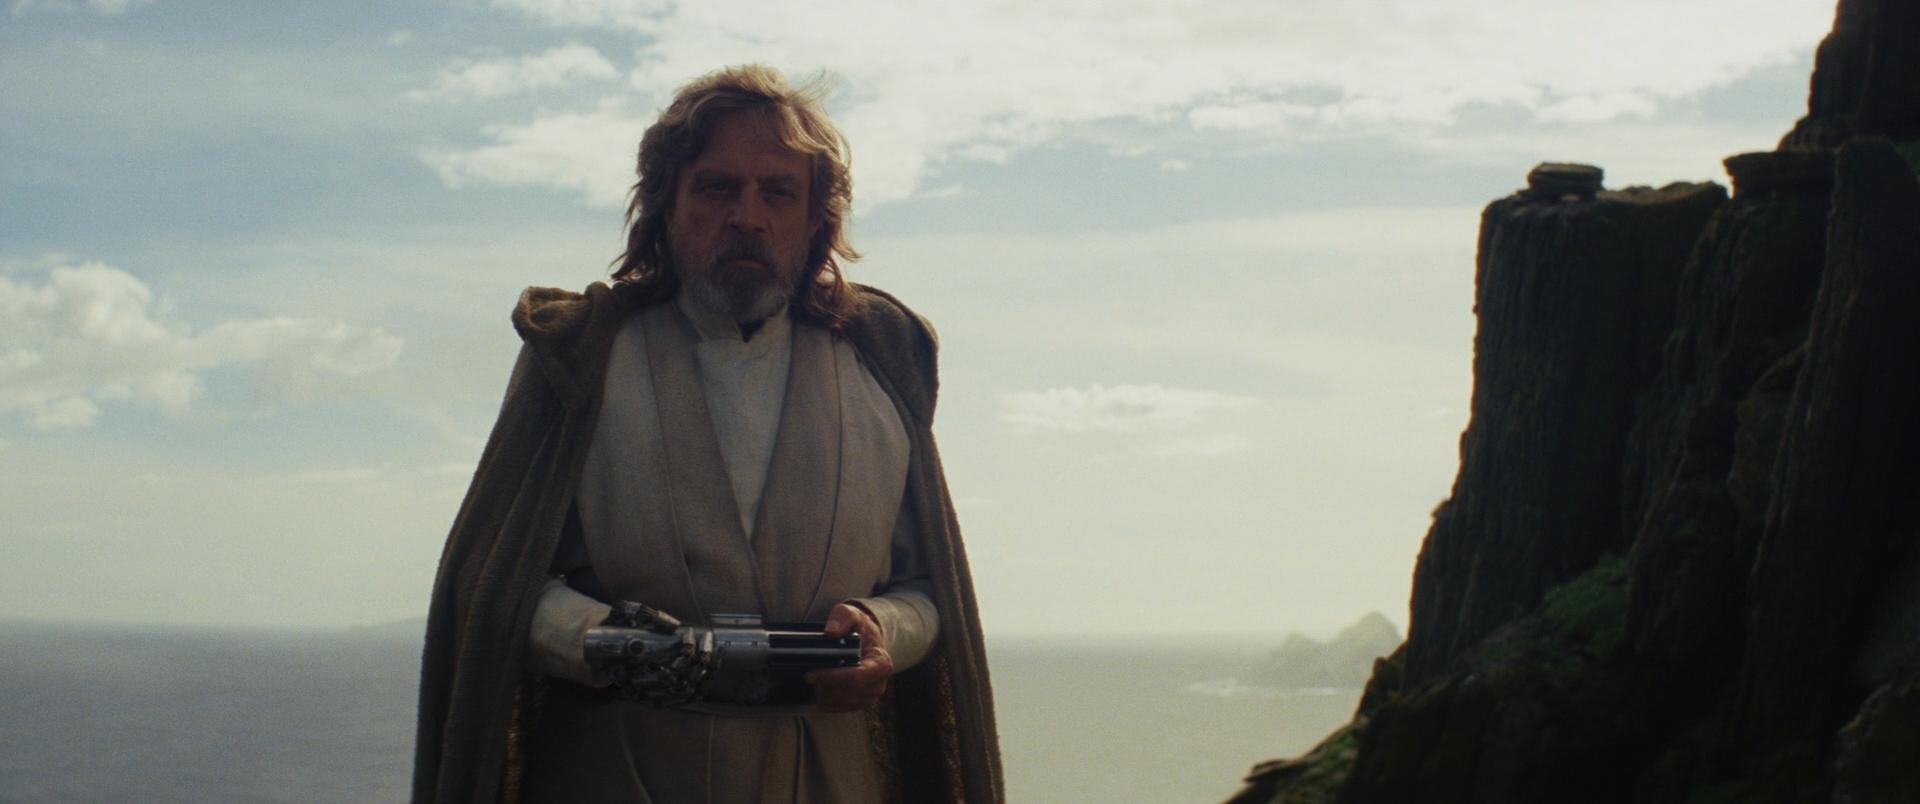 Звёздные войны: Последние джедаи / Star Wars: The Last Jedi (2017/BDRip) 1080p, Лицензия